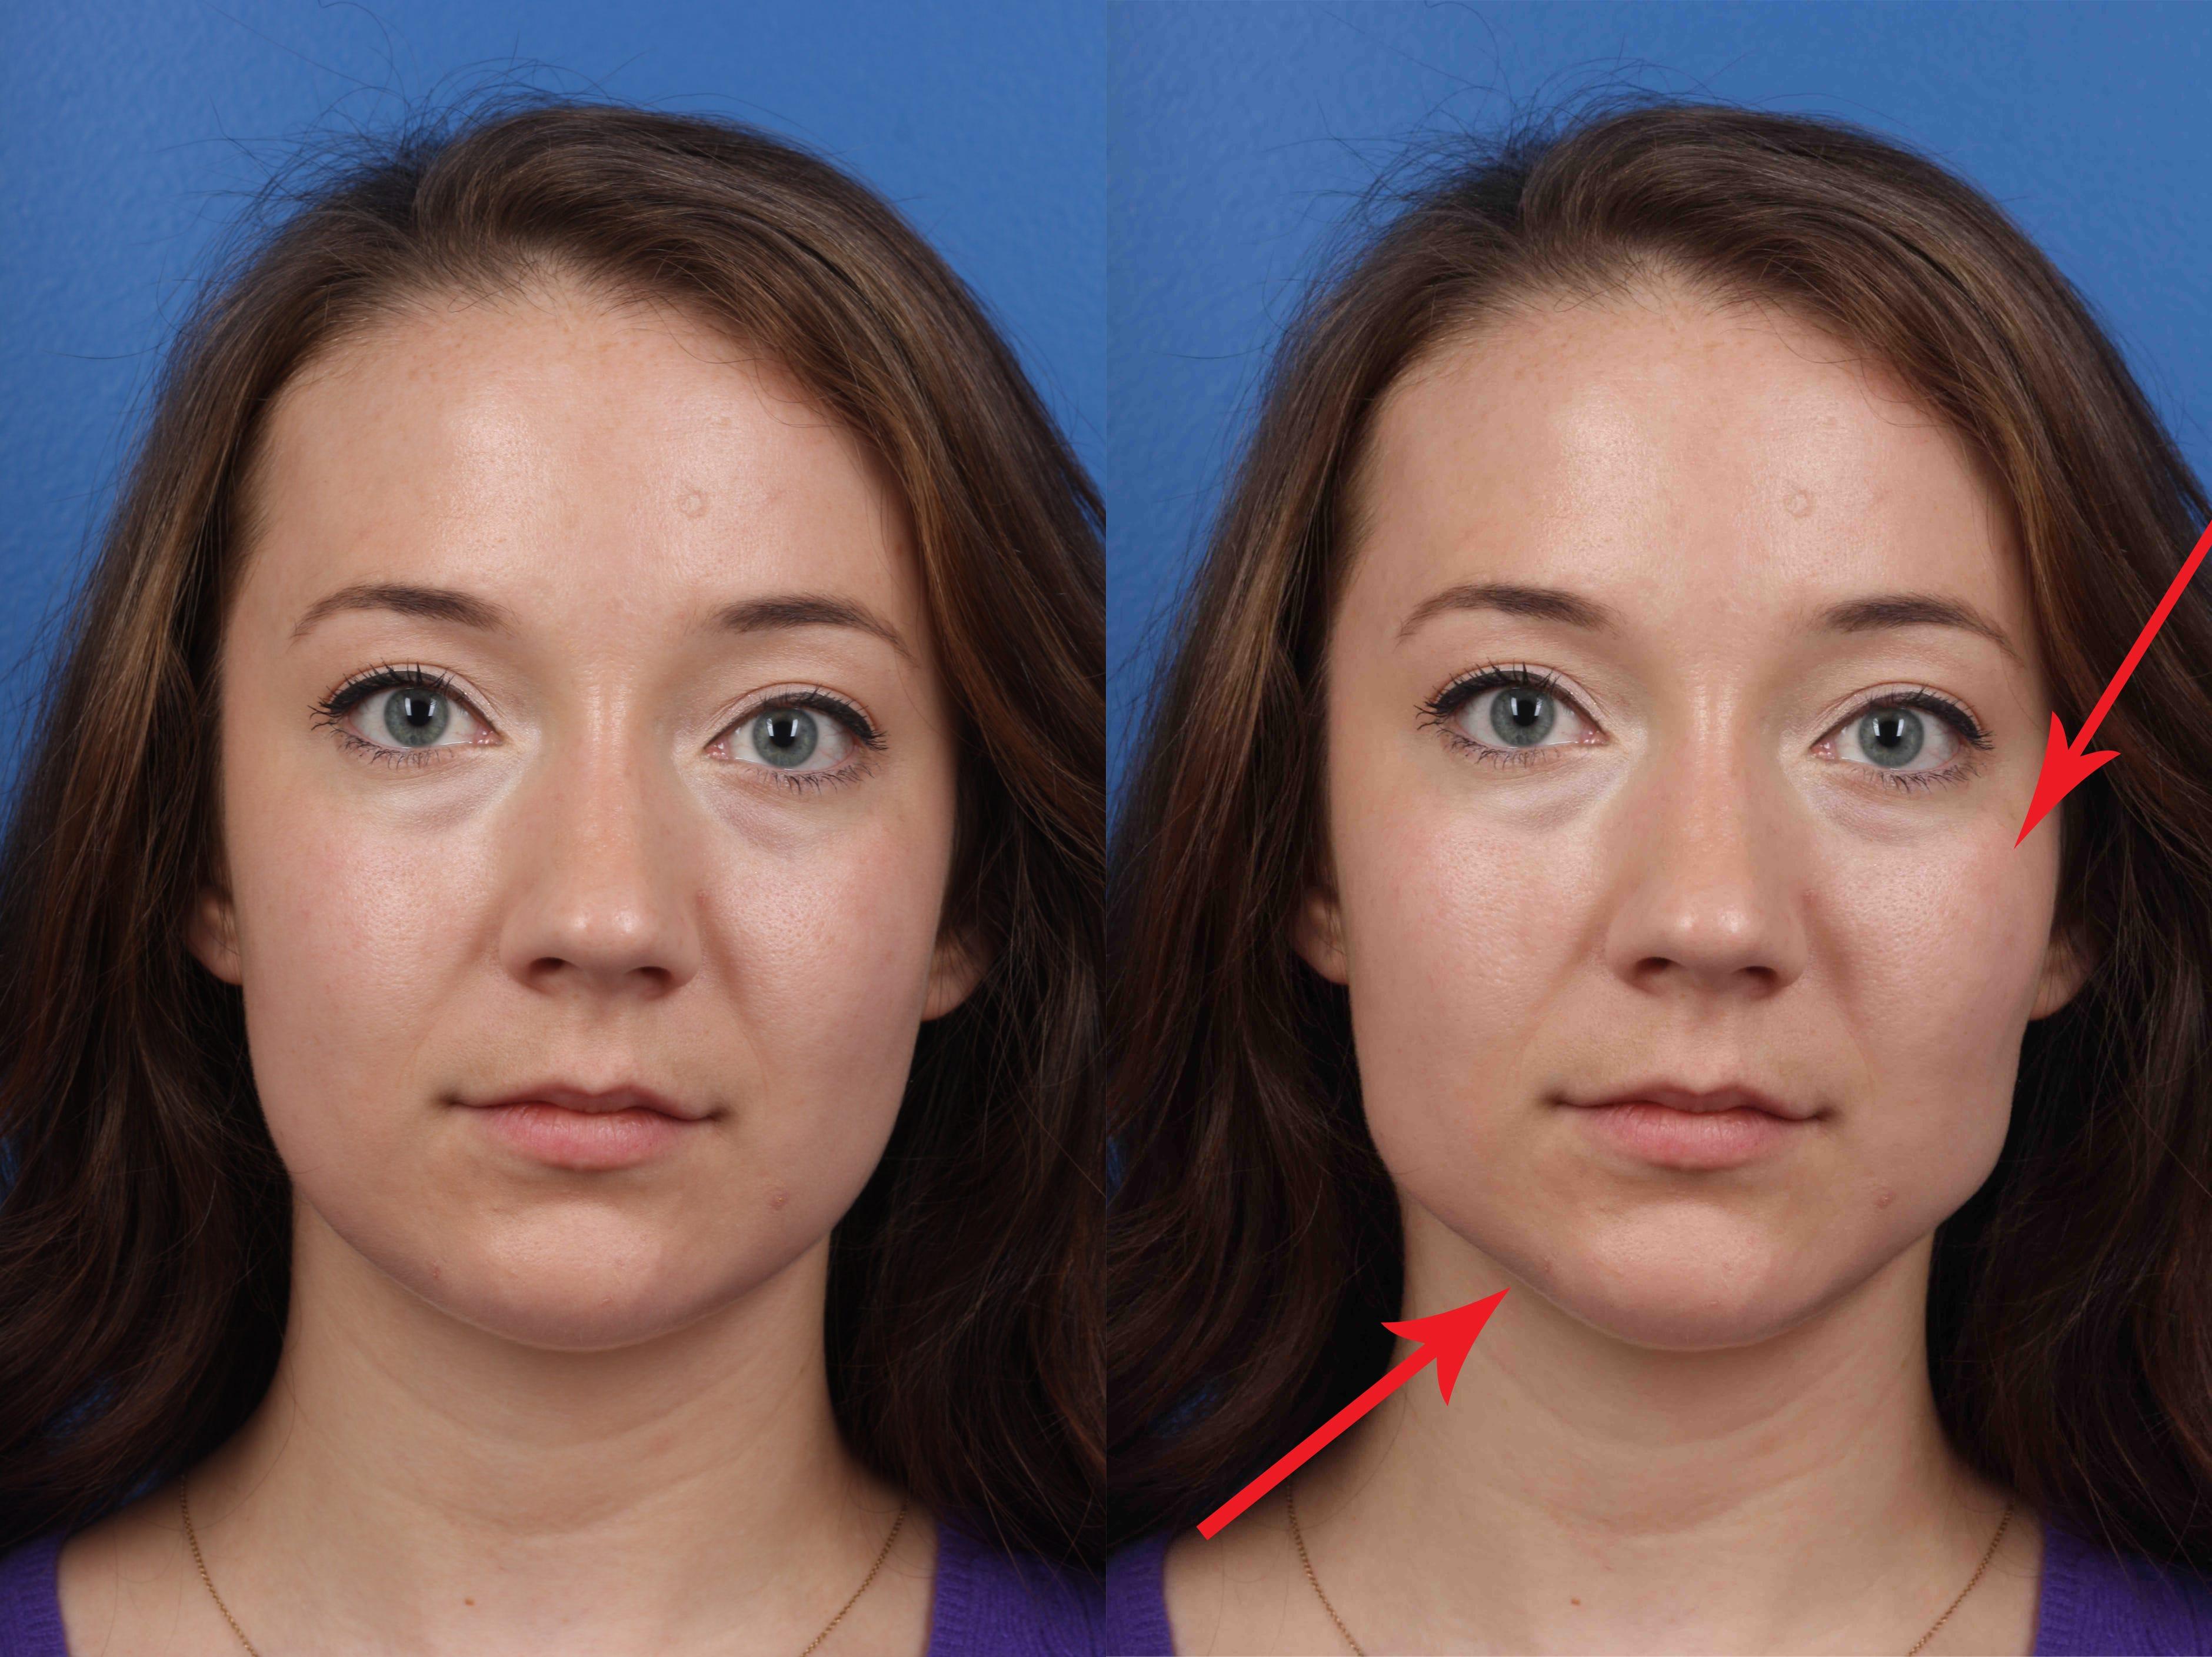 Tiger's E. reccomend Epichlorohydrin limits in facial tissue + prop 65